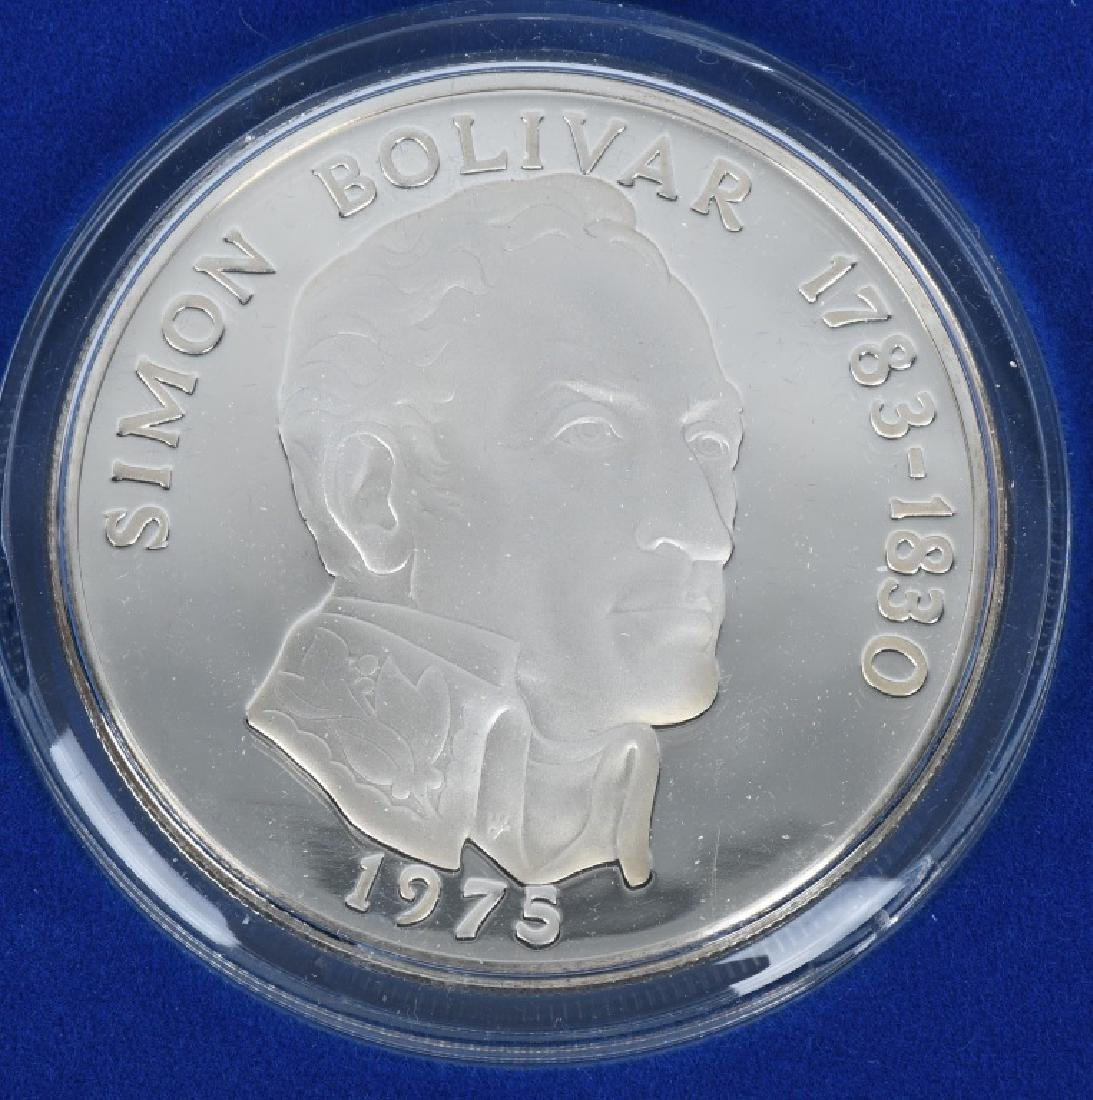 4-REPUBLIC of PANAMA SILVER, 20 BALBOAS & MORE - 2